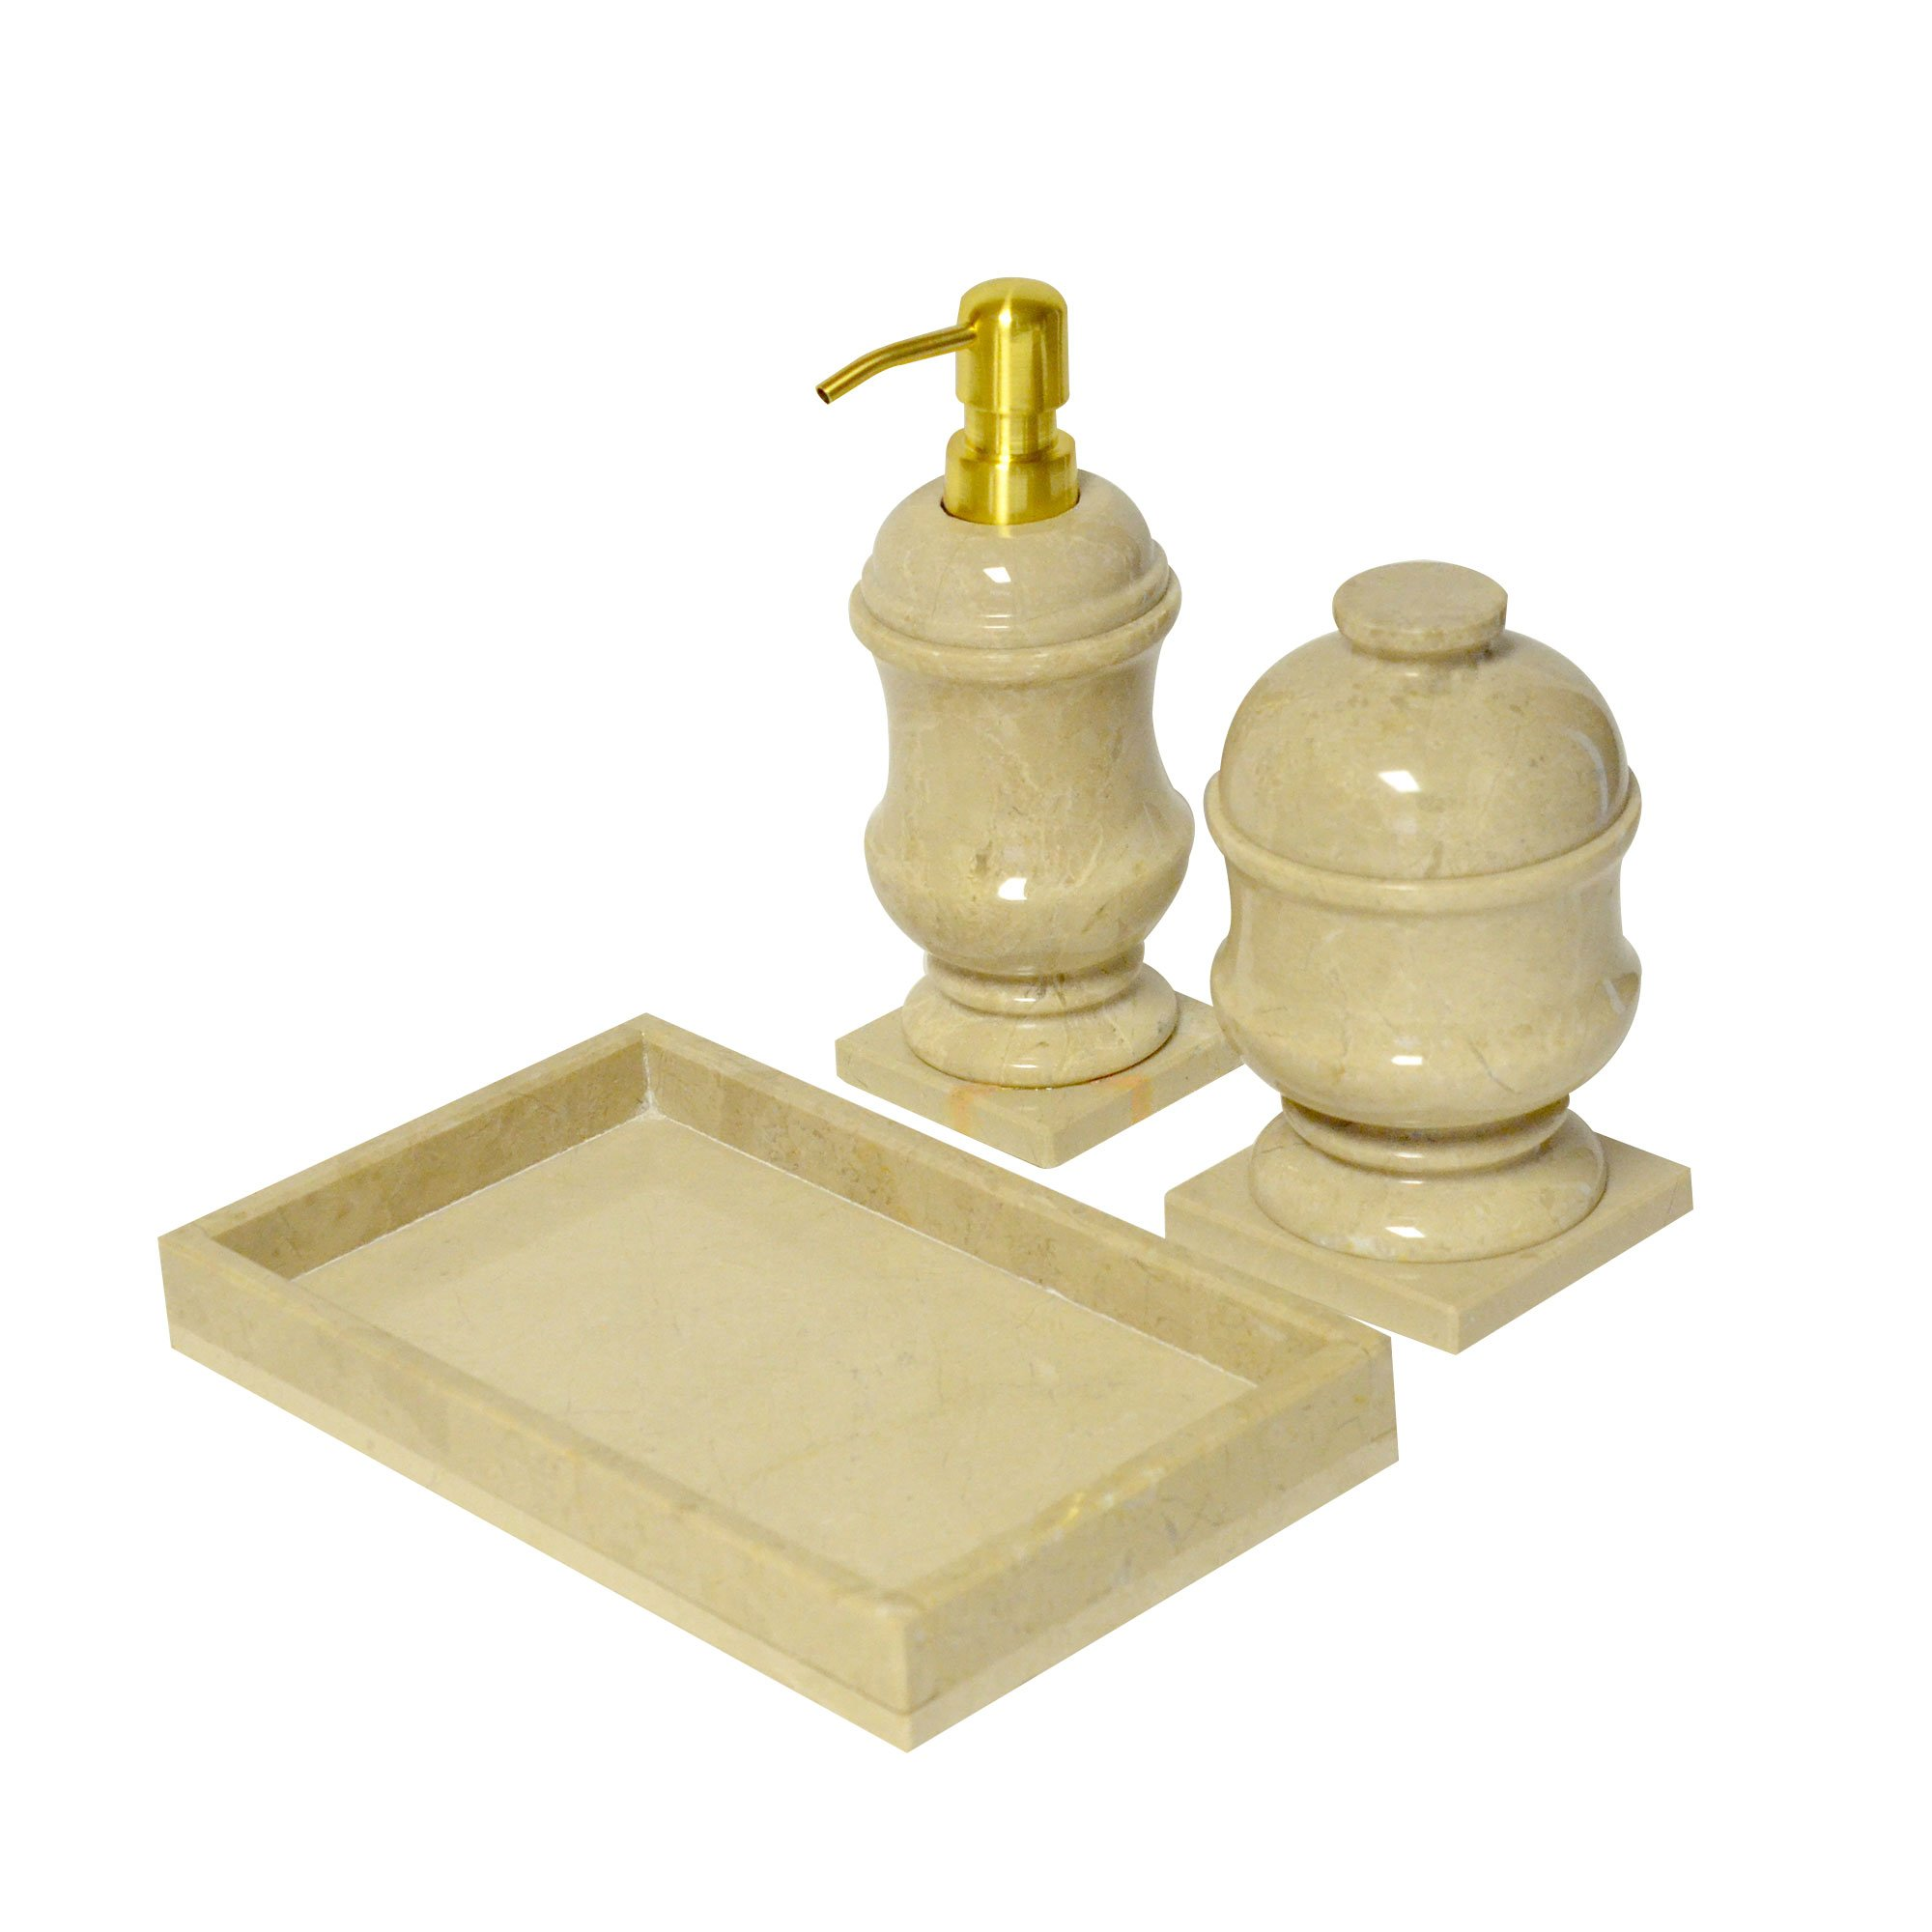 3 PCS Polished Marble Bath Set Soap Caddy Shampoo Dispenser Shower ...